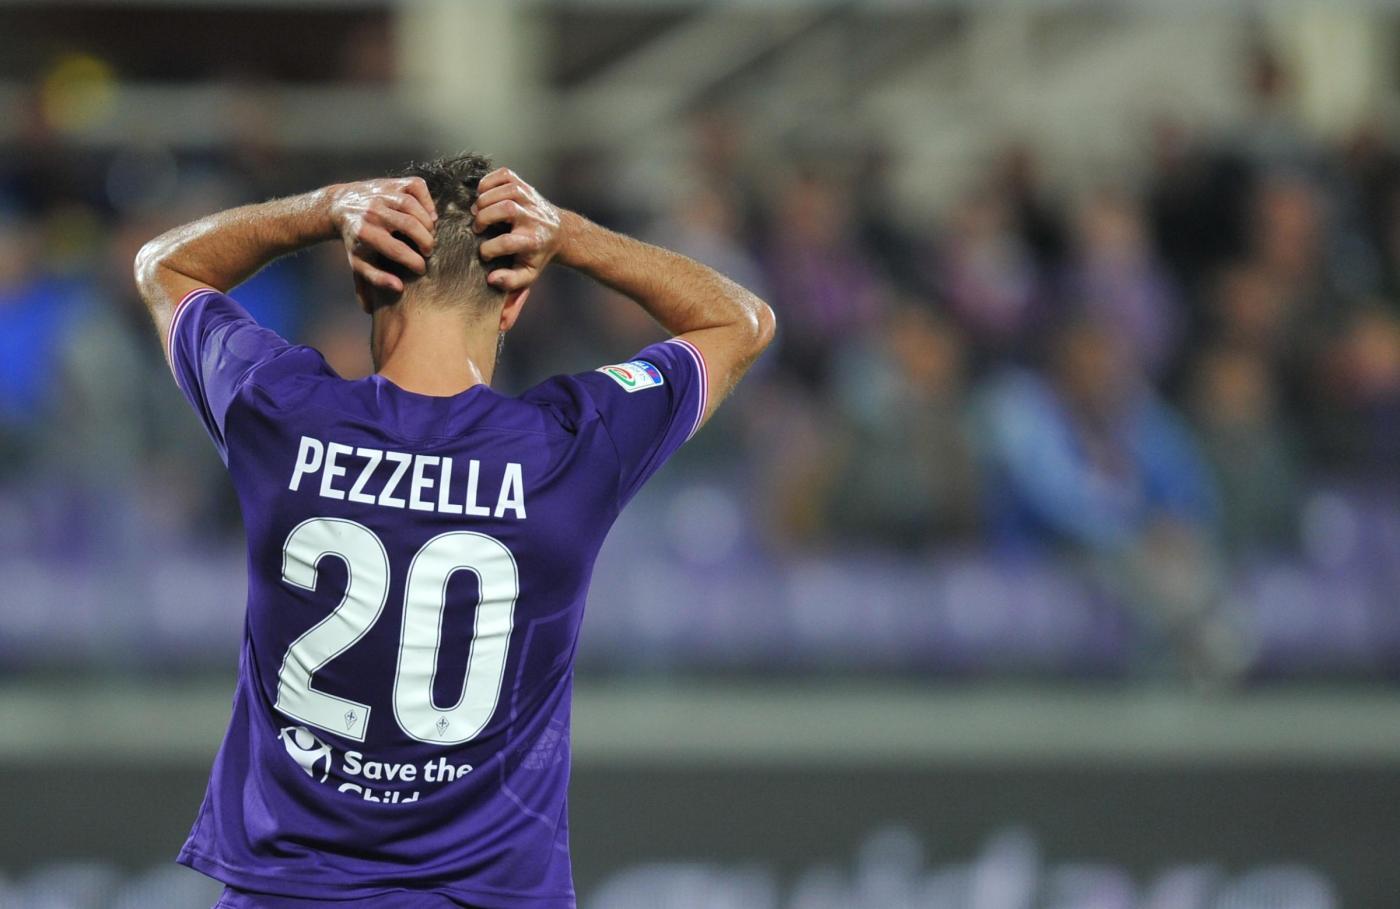 Pezzella (Foto LaPresse/Jennifer Lorenzini)